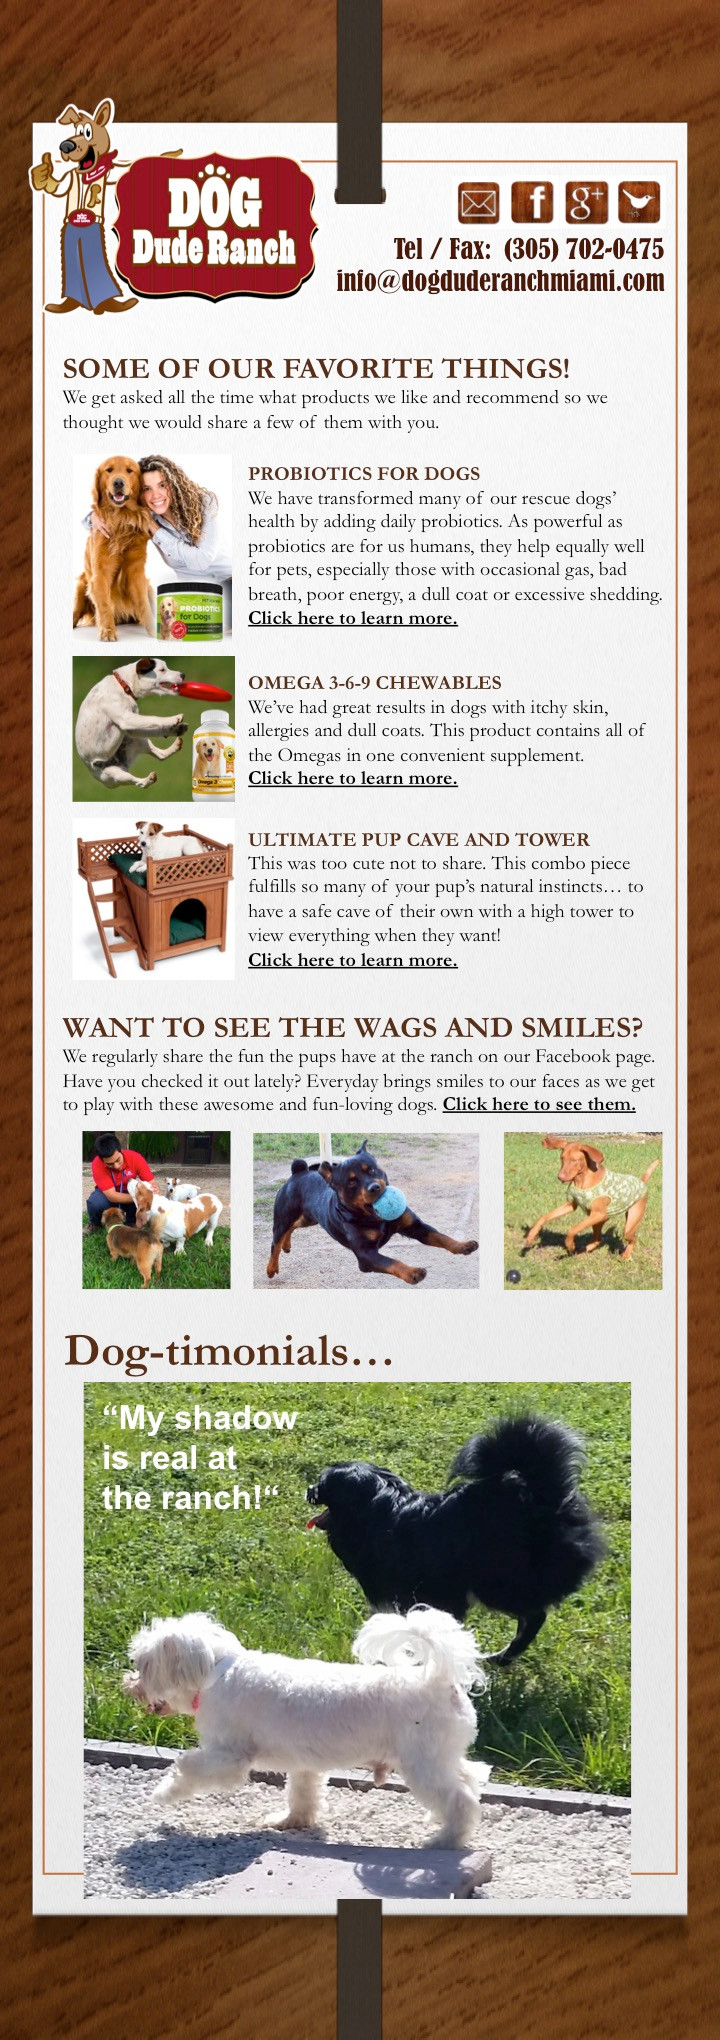 Dog Dude Ranch Newsletter